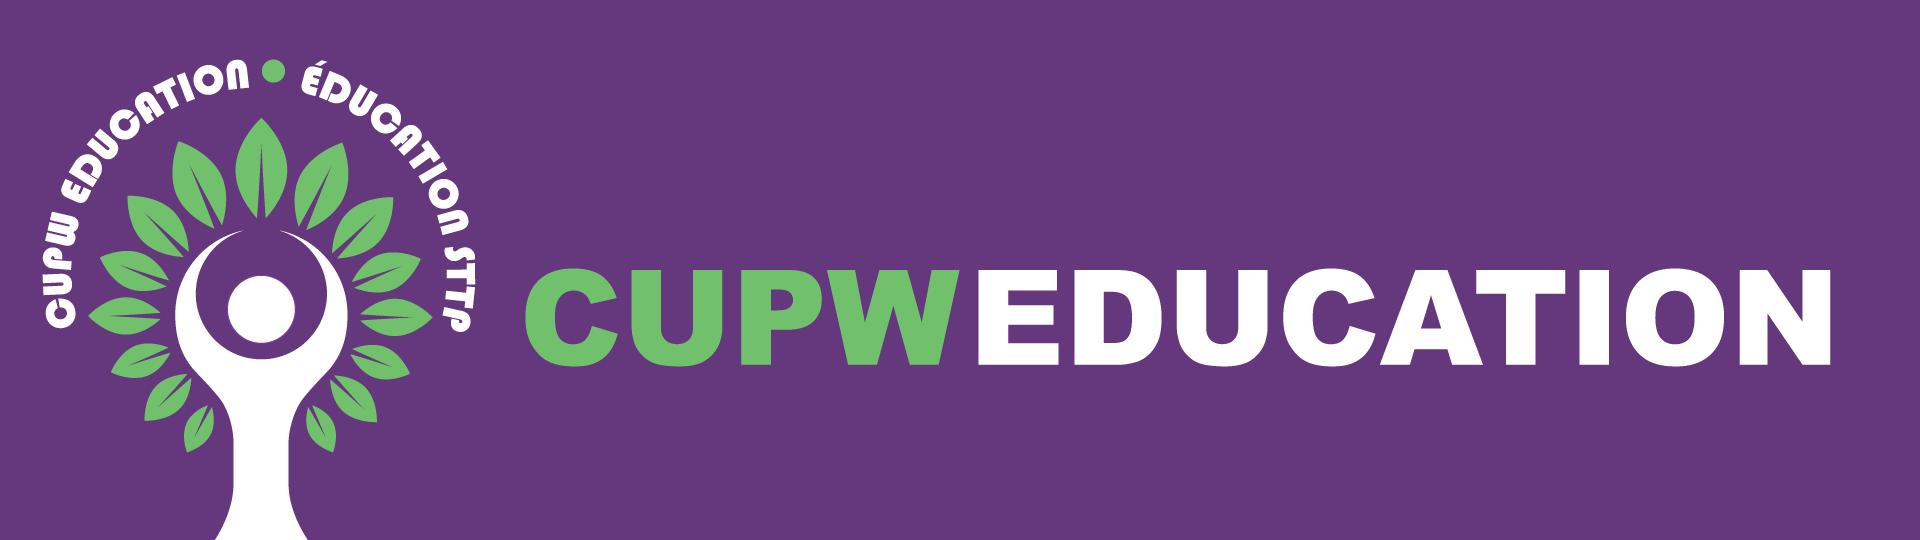 CUPW Education